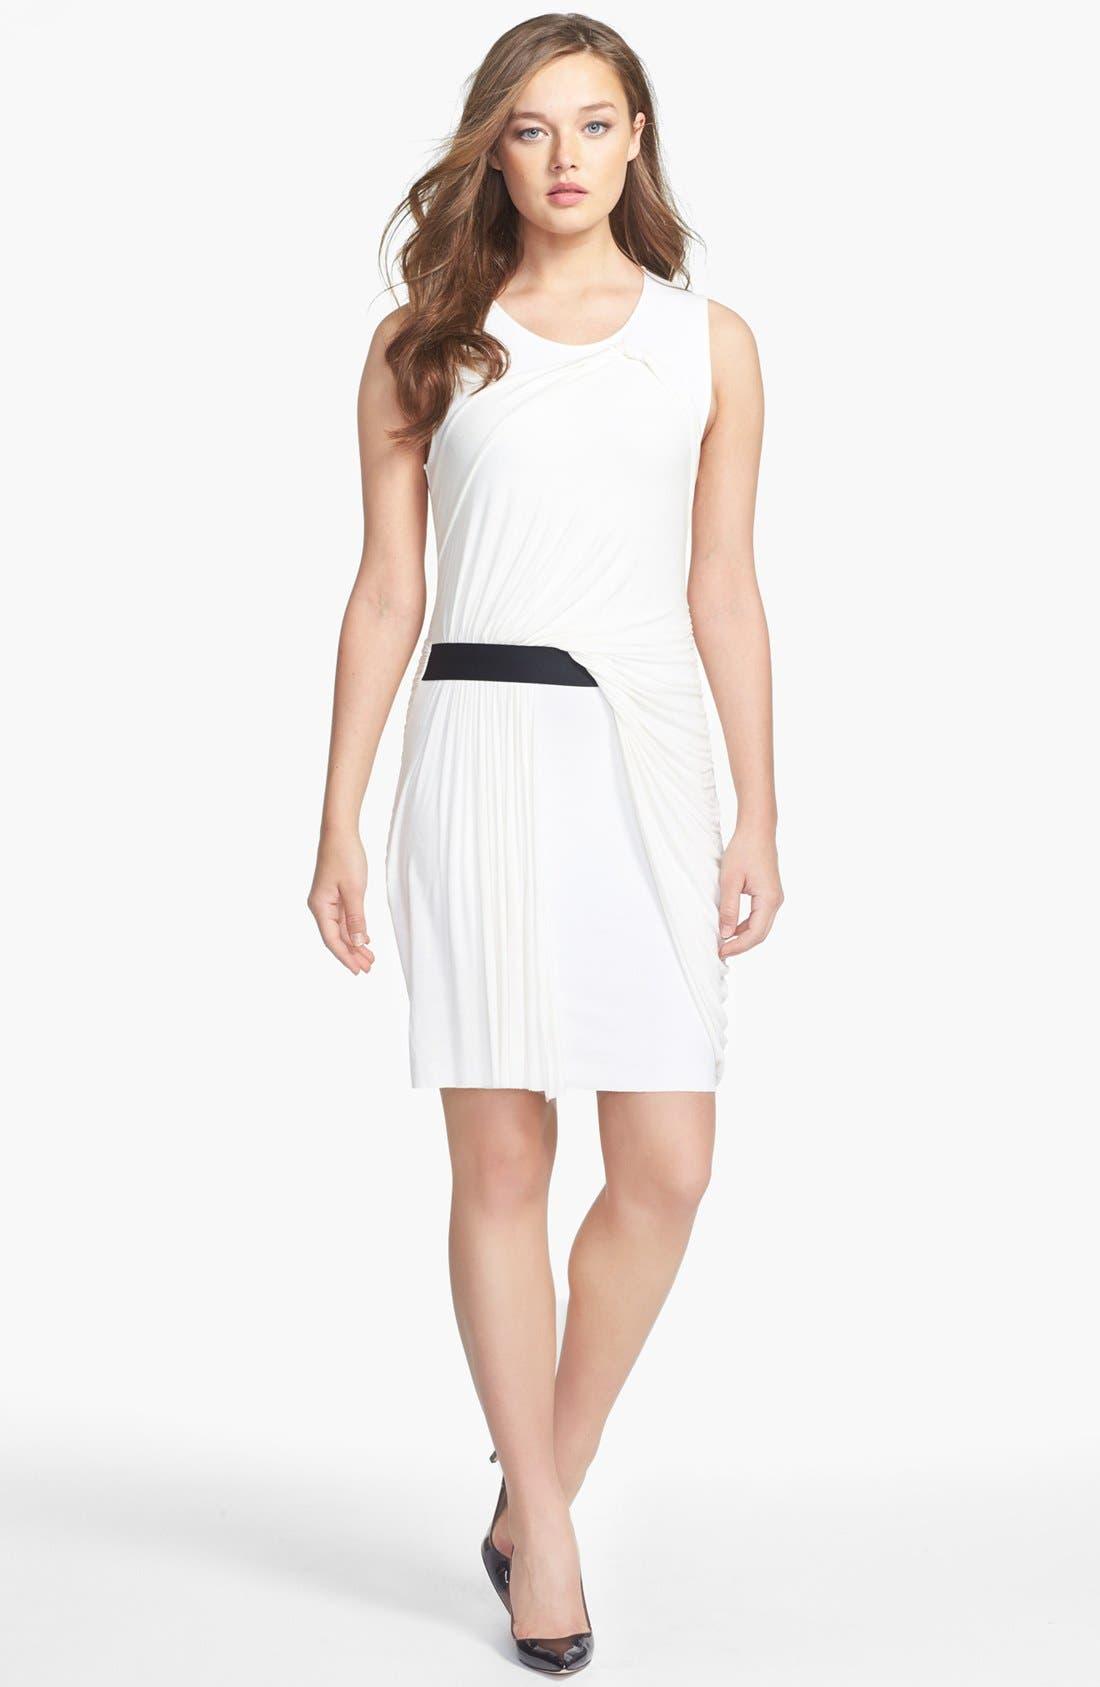 Main Image - B44 Dressed by Bailey 44 'Quasar' Draped Ponte Knit Dress